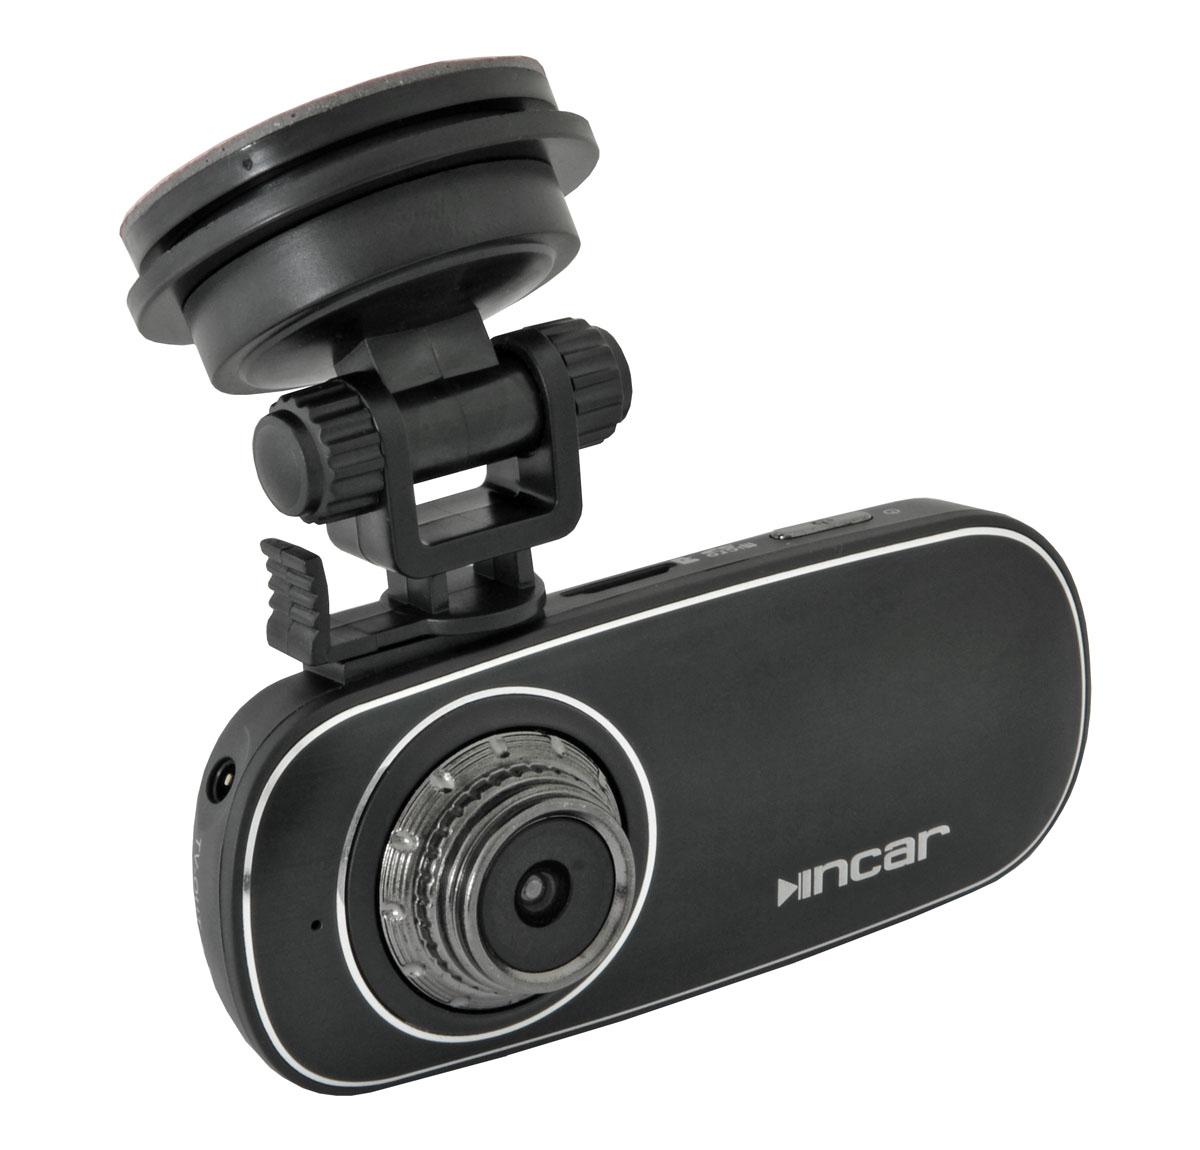 Видеорегистратор incar vr-930 full hd видеорегистратор hiq 2004h отзывы